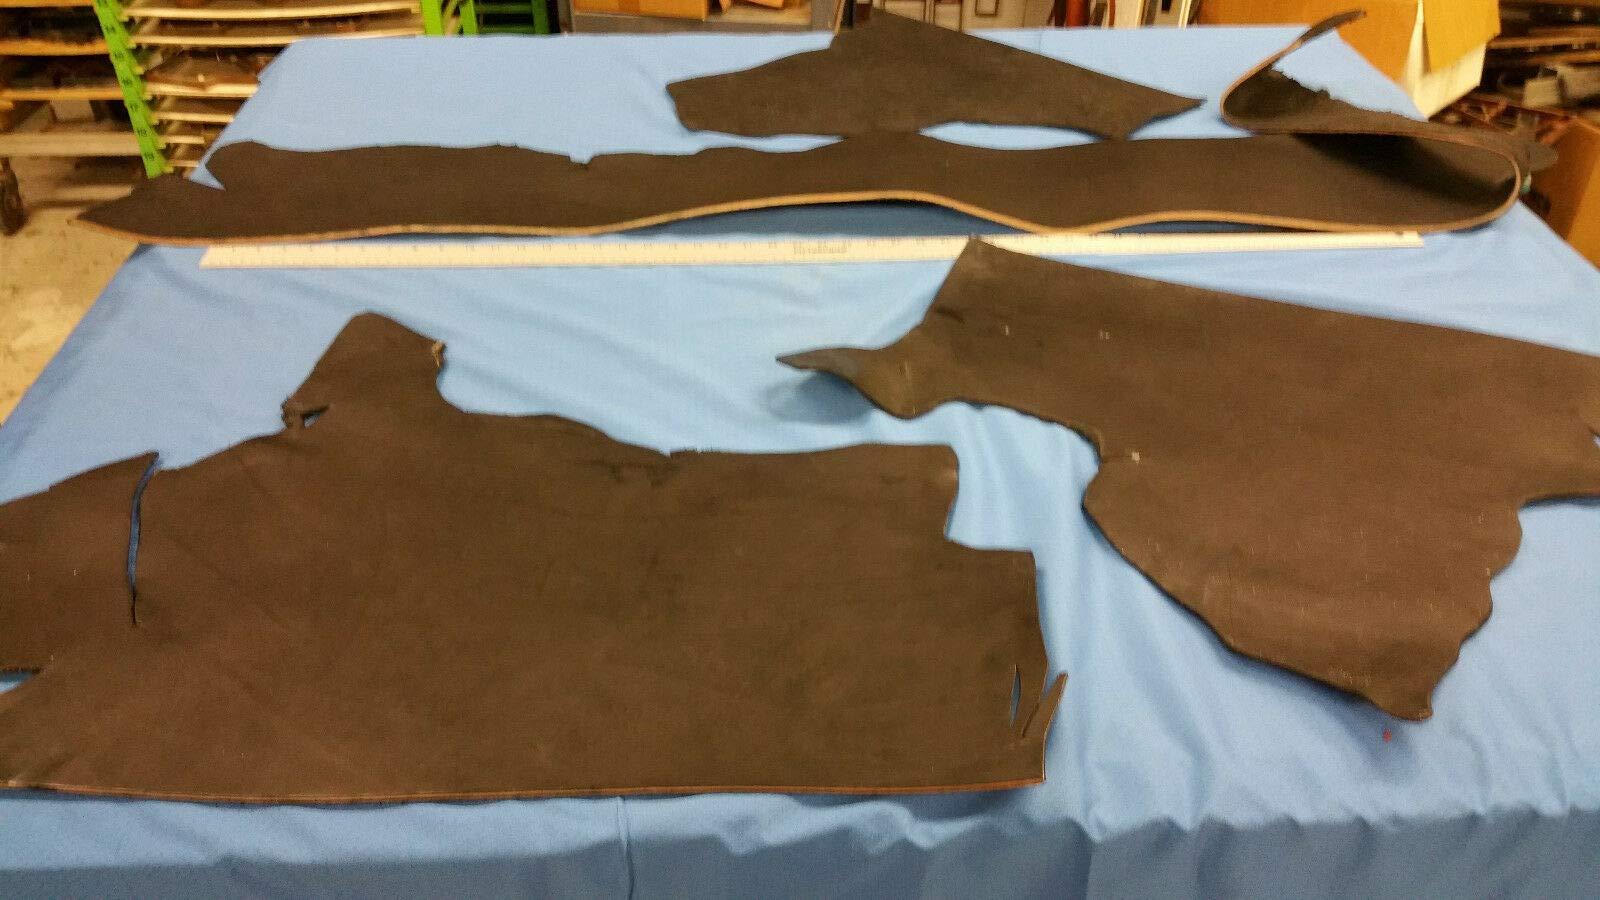 Veg-Tann/Harness/Bridle Full Grain Leather Black, Bundle #11/10 oz +